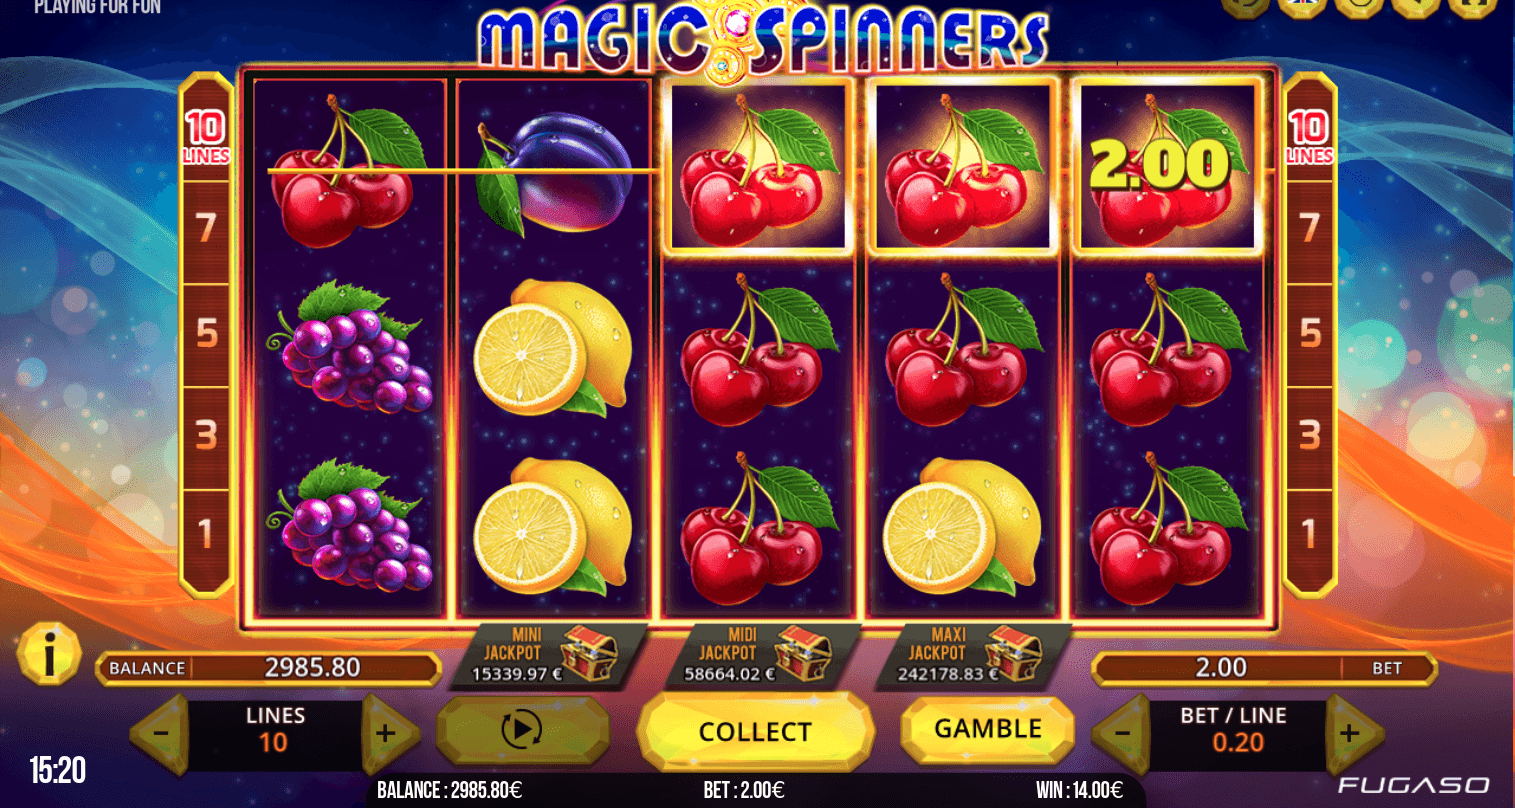 Magic Spinners Fugaso